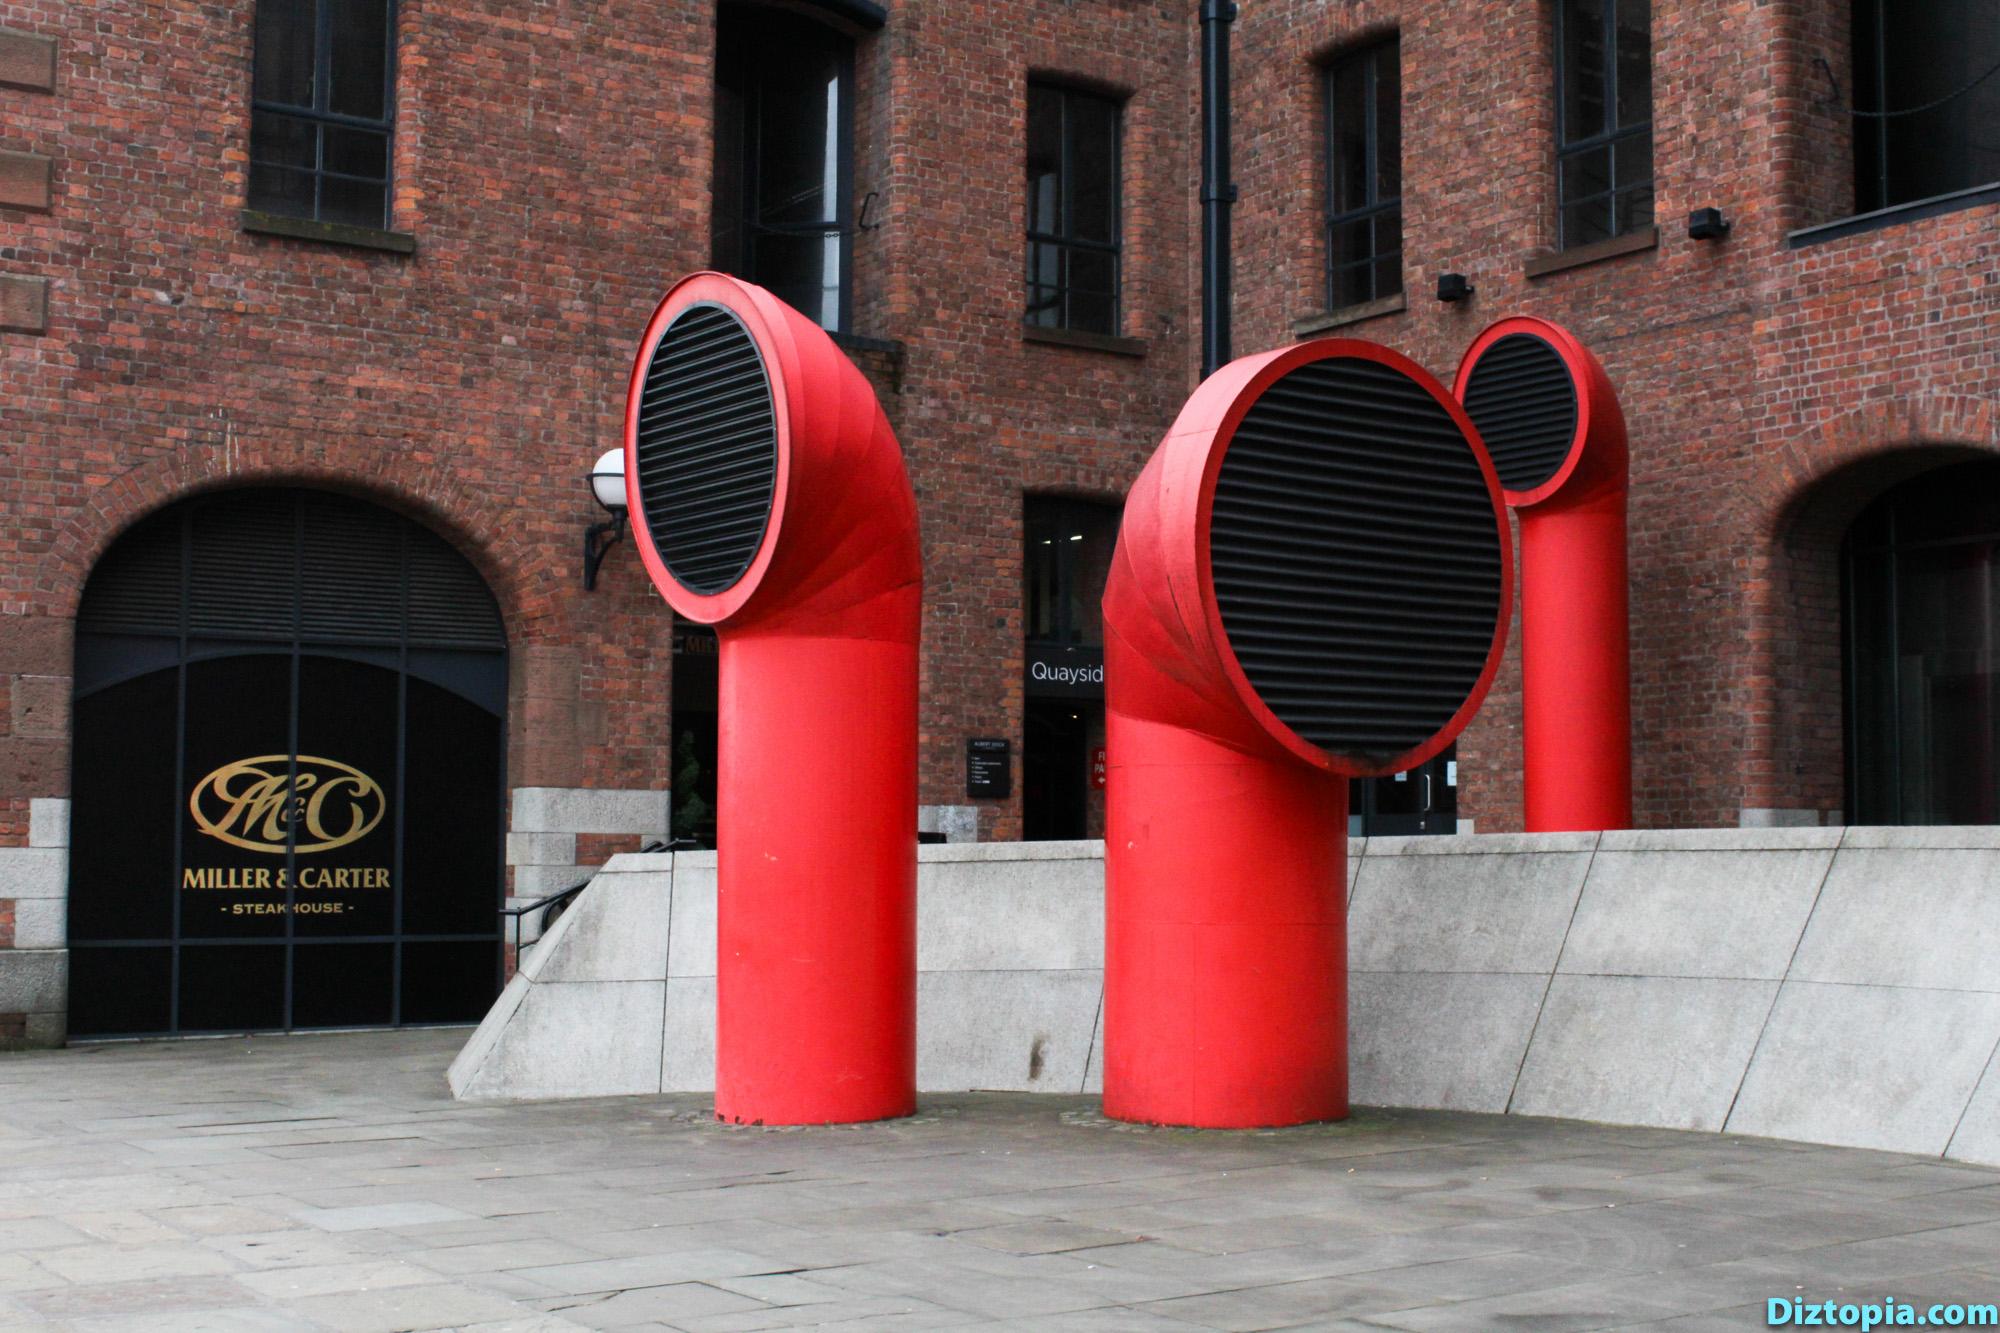 Liverpool-City-UK-Diztopia-Dizma-Dahl-Photography-2017-23-Albert-Dock-Queens-Wapping-Salthouse-Canning-Coburg-Dukes